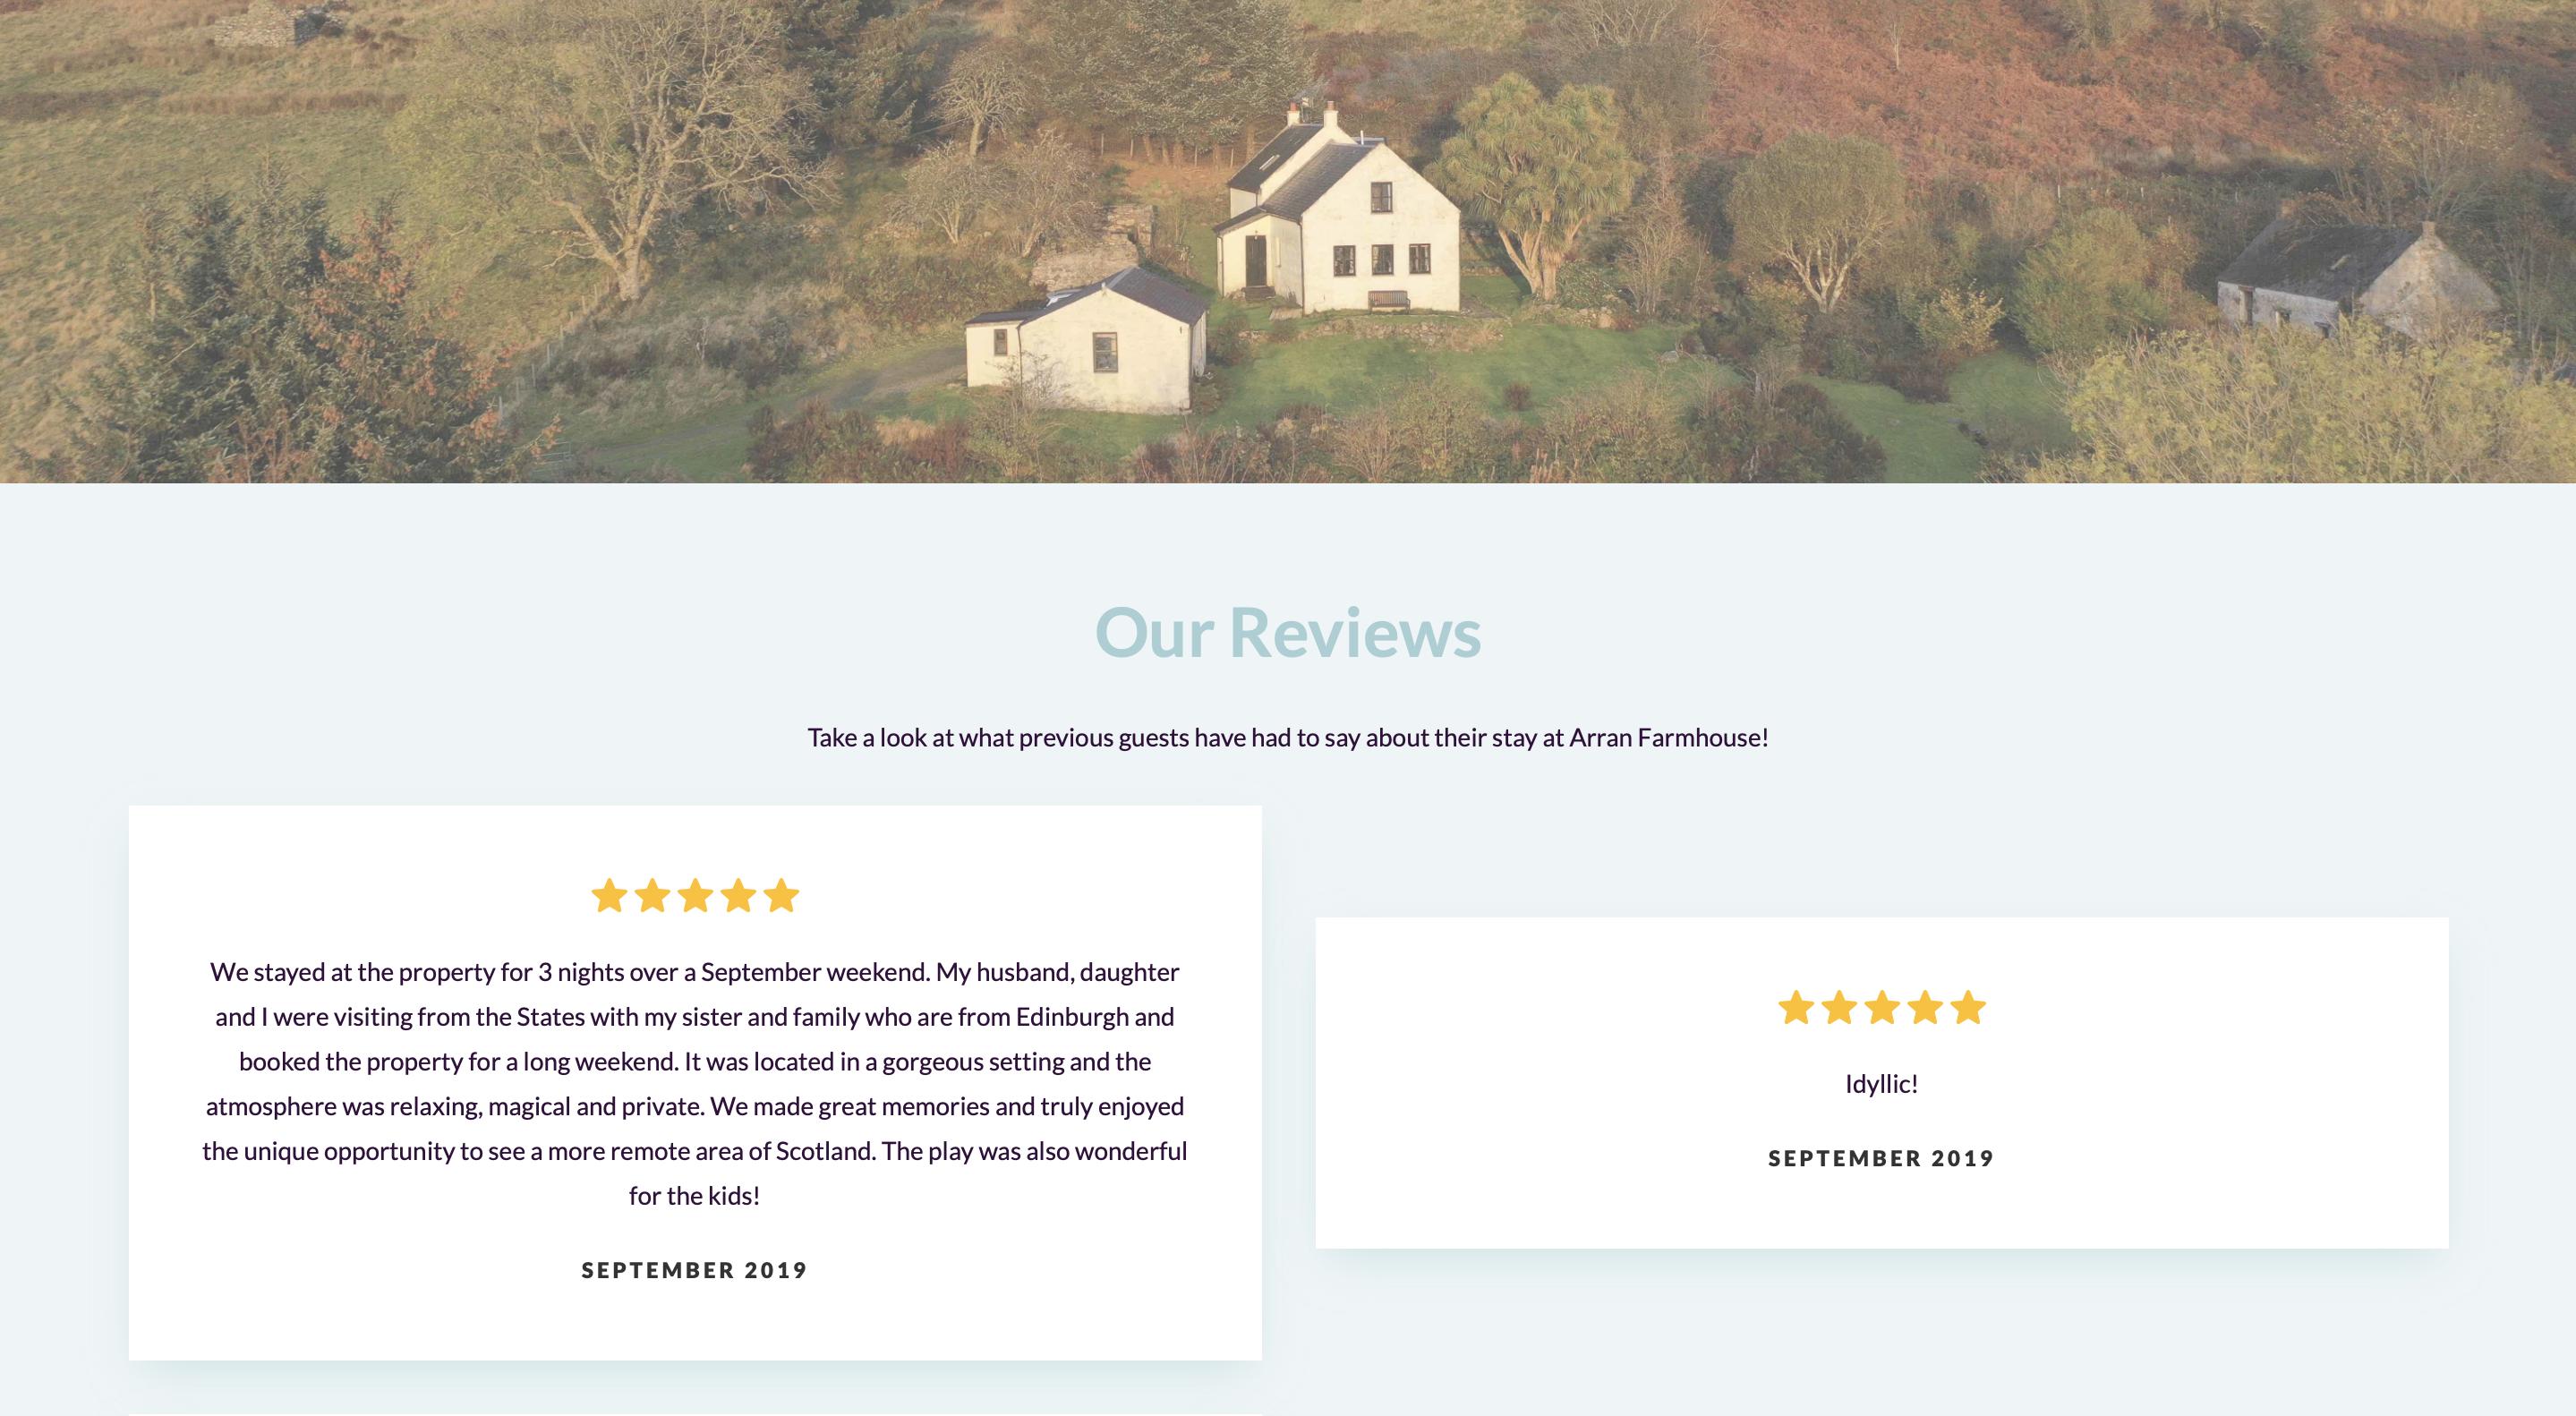 Arran Farmhouse reviews page